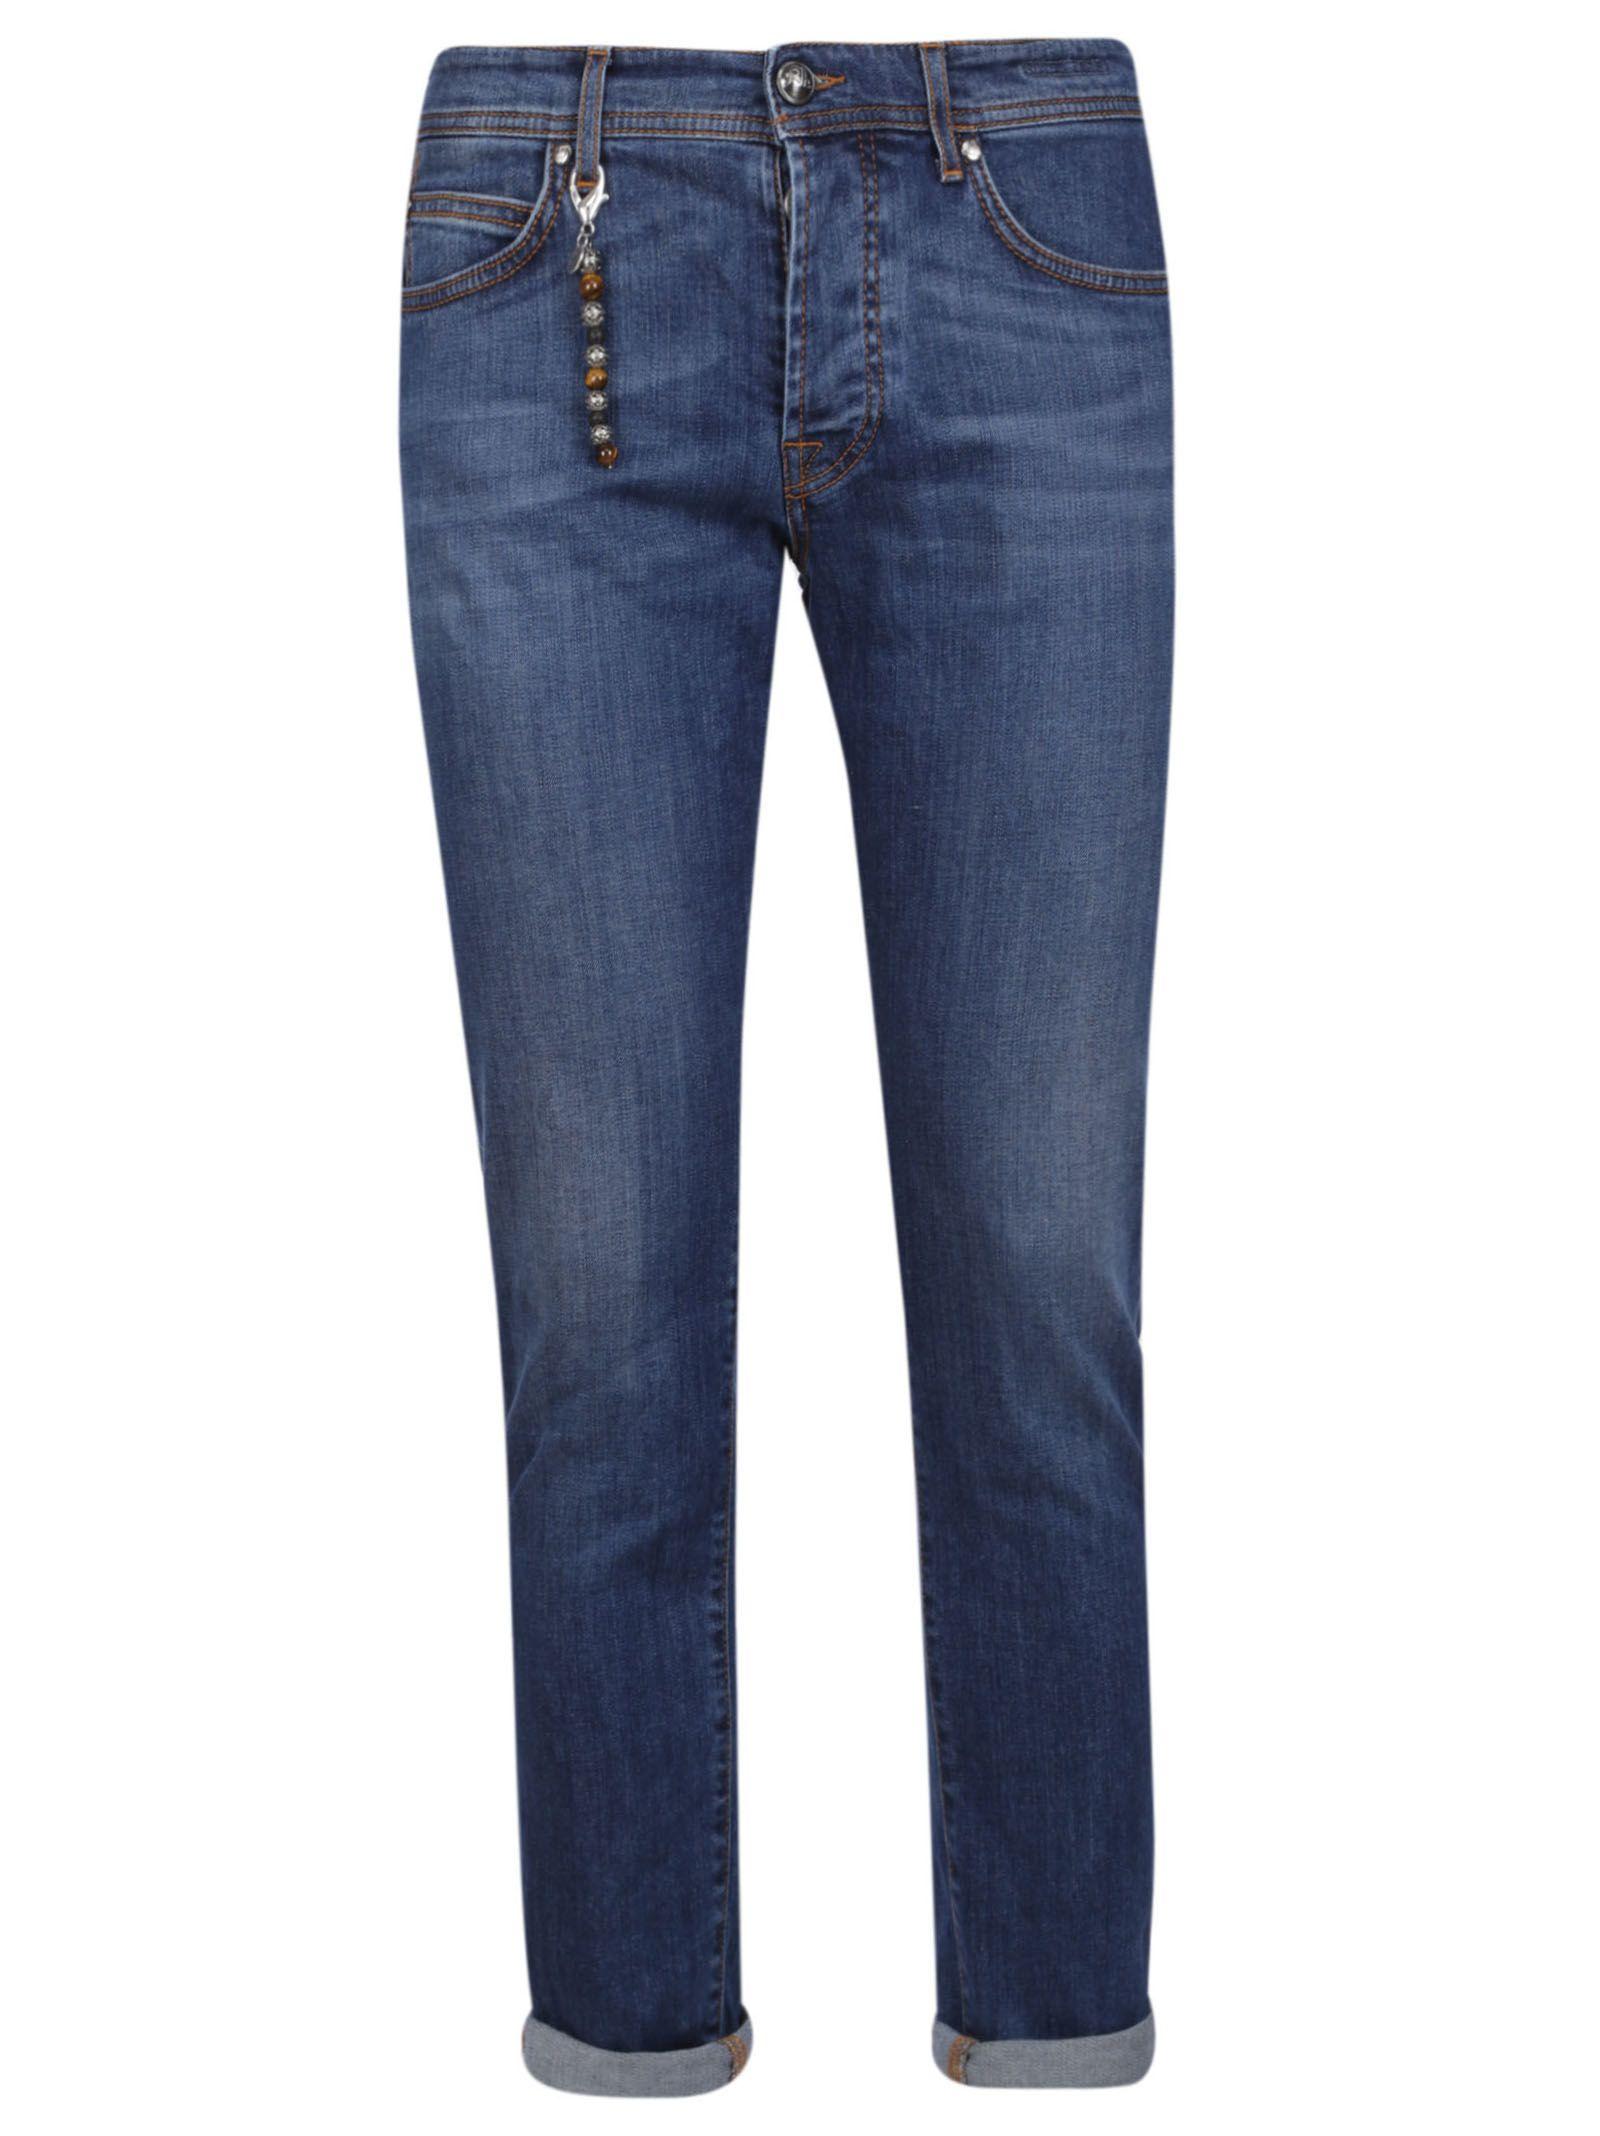 ROY ROGERS Zonta Jeans in Denim